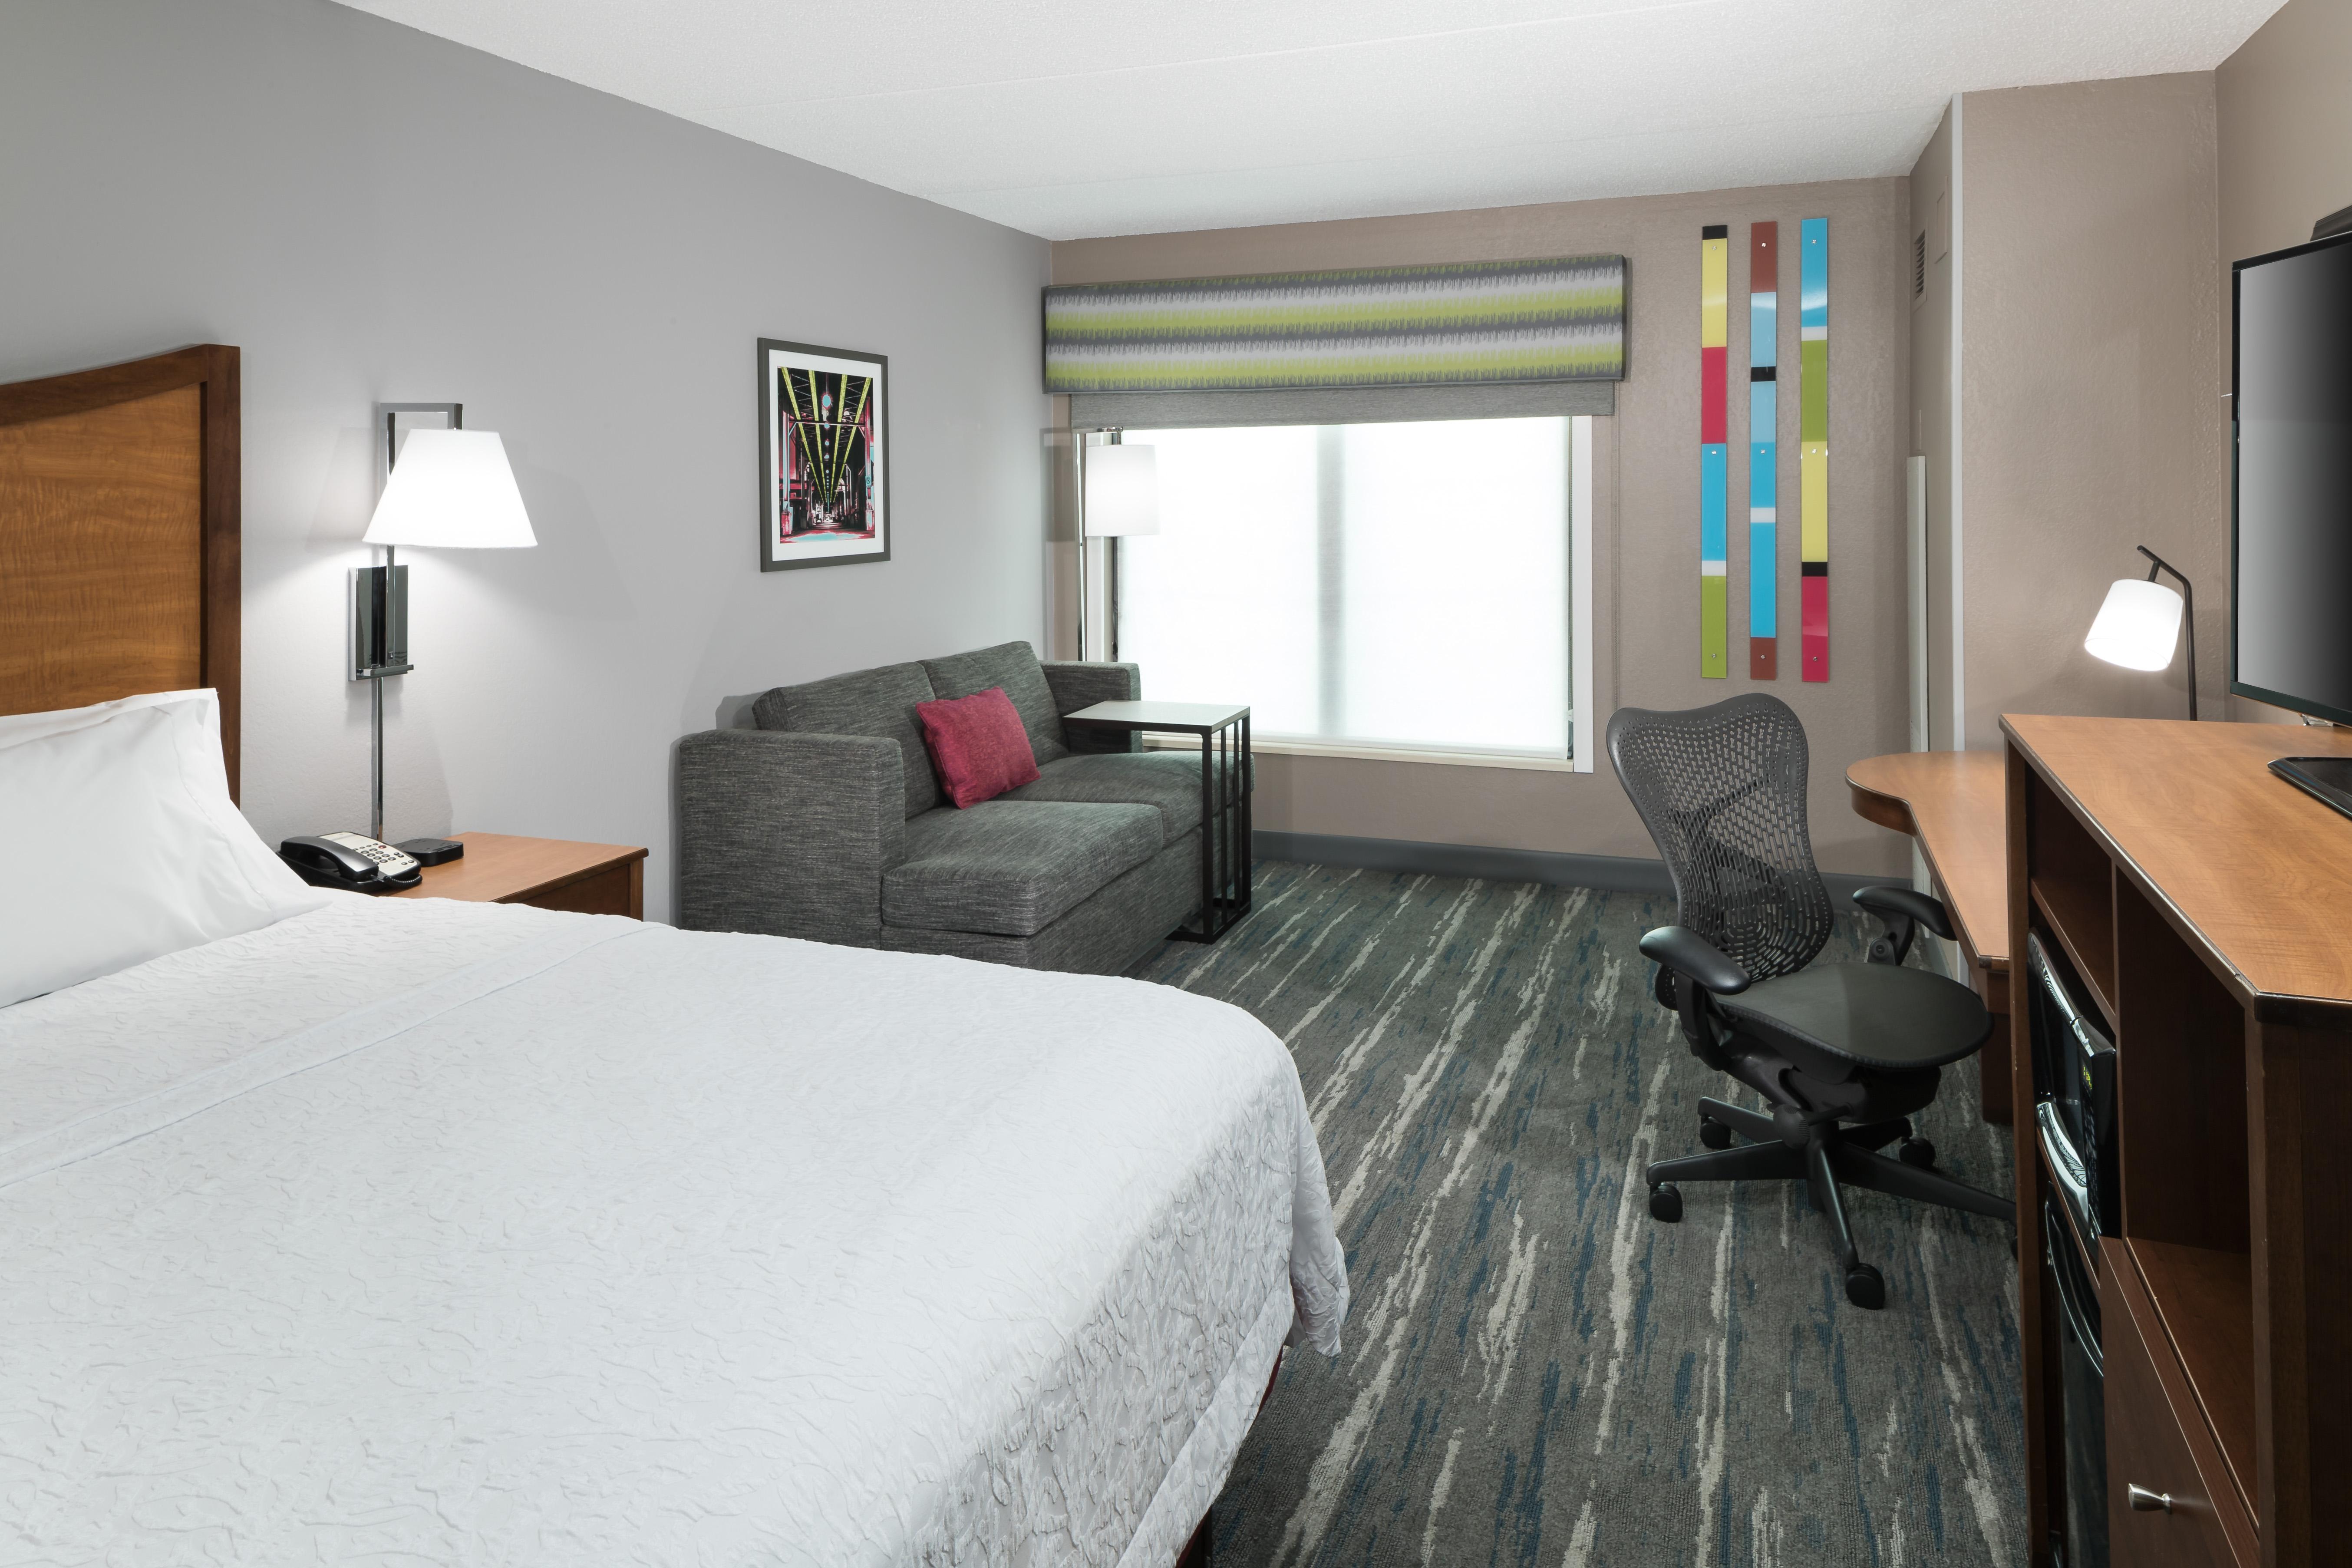 https://www.hotelsbyday.com/_data/default-hotel_image/4/23595/ahr-4274-chiskhx-320-kxty.jpg